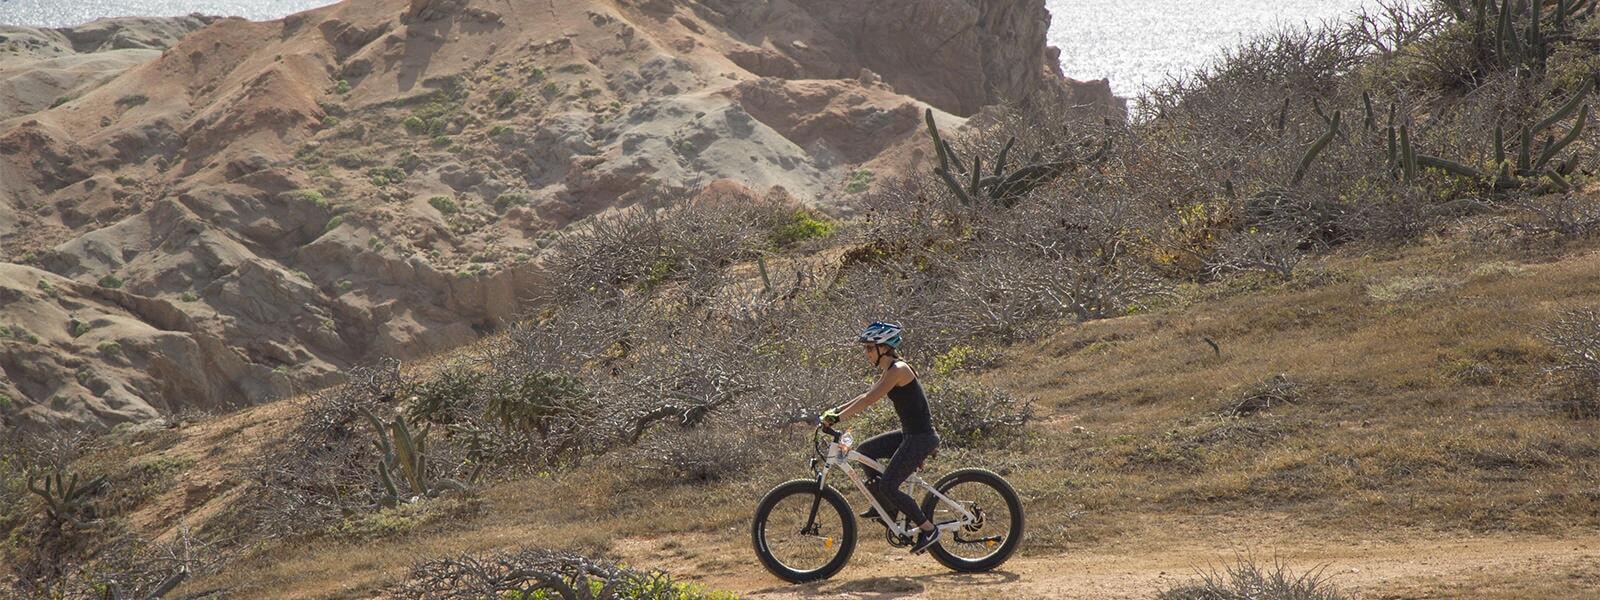 electric-bike-adventure-desert